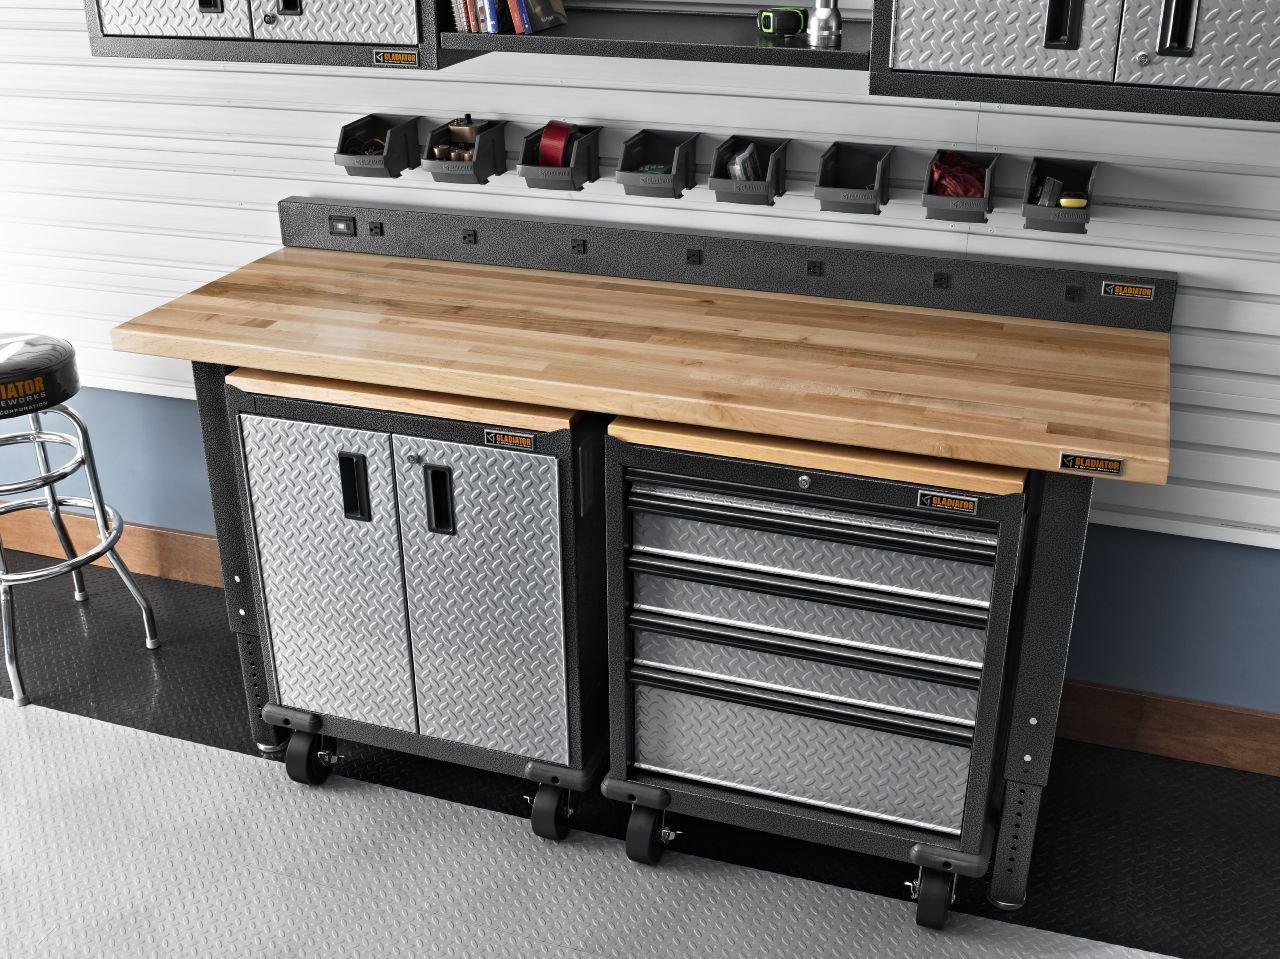 res ultrahd workbench bench s ebay top heavy work adjustable height duty itm wood